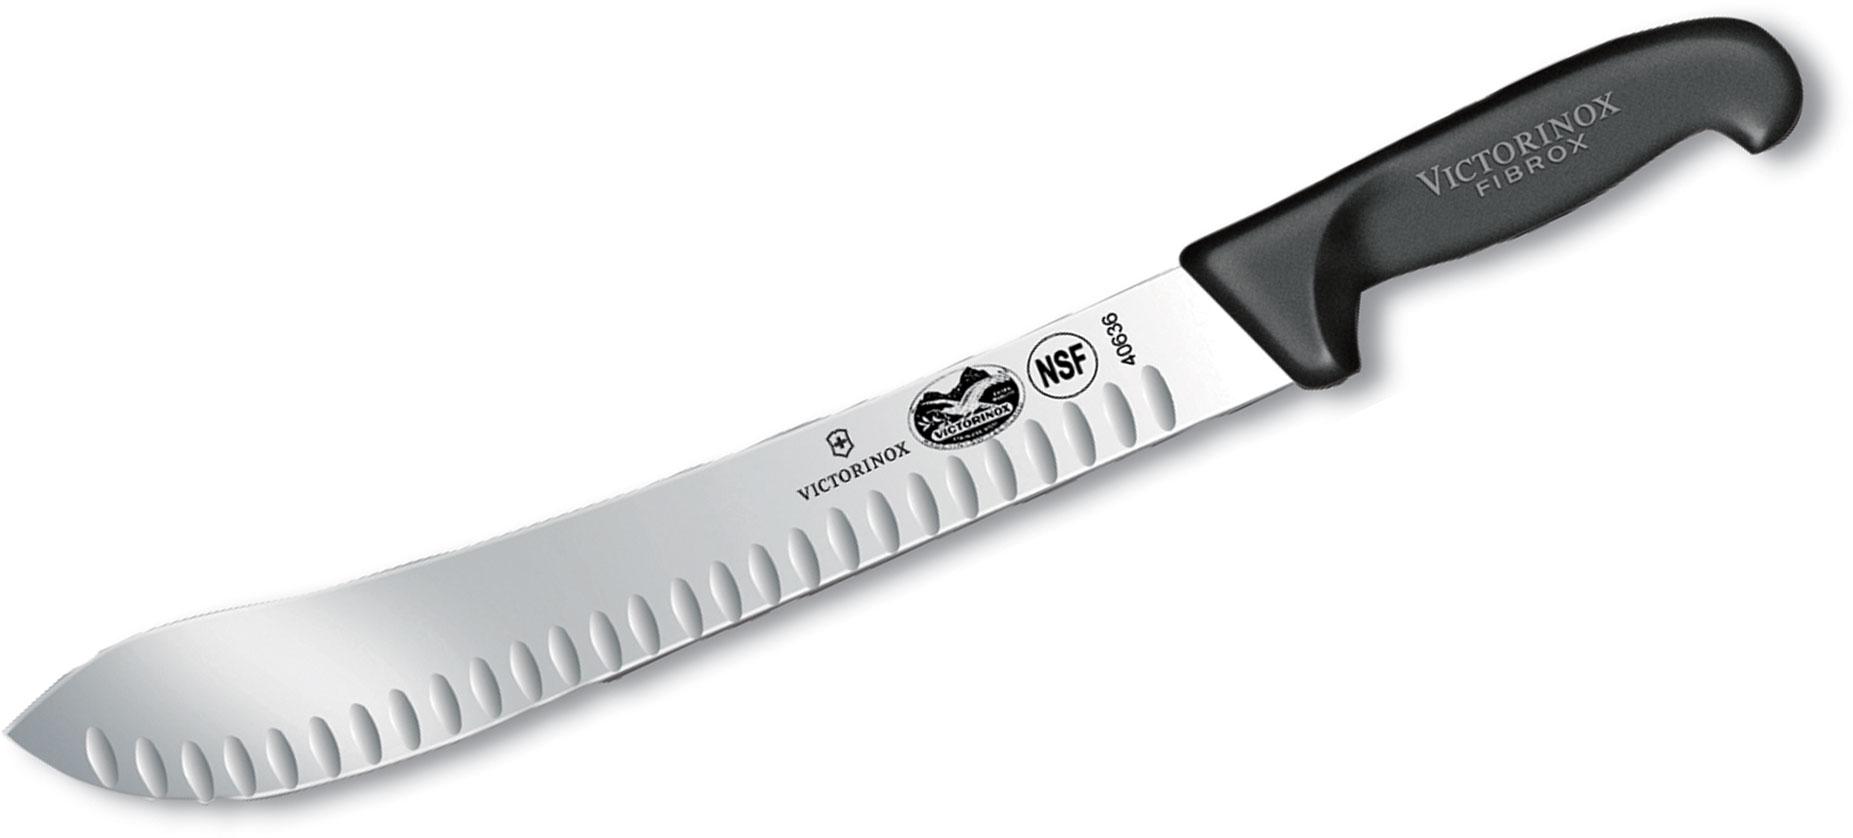 Victorinox Forschner Fibrox 12 inch Granton Edge Butcher Knife, Black TPE Handle